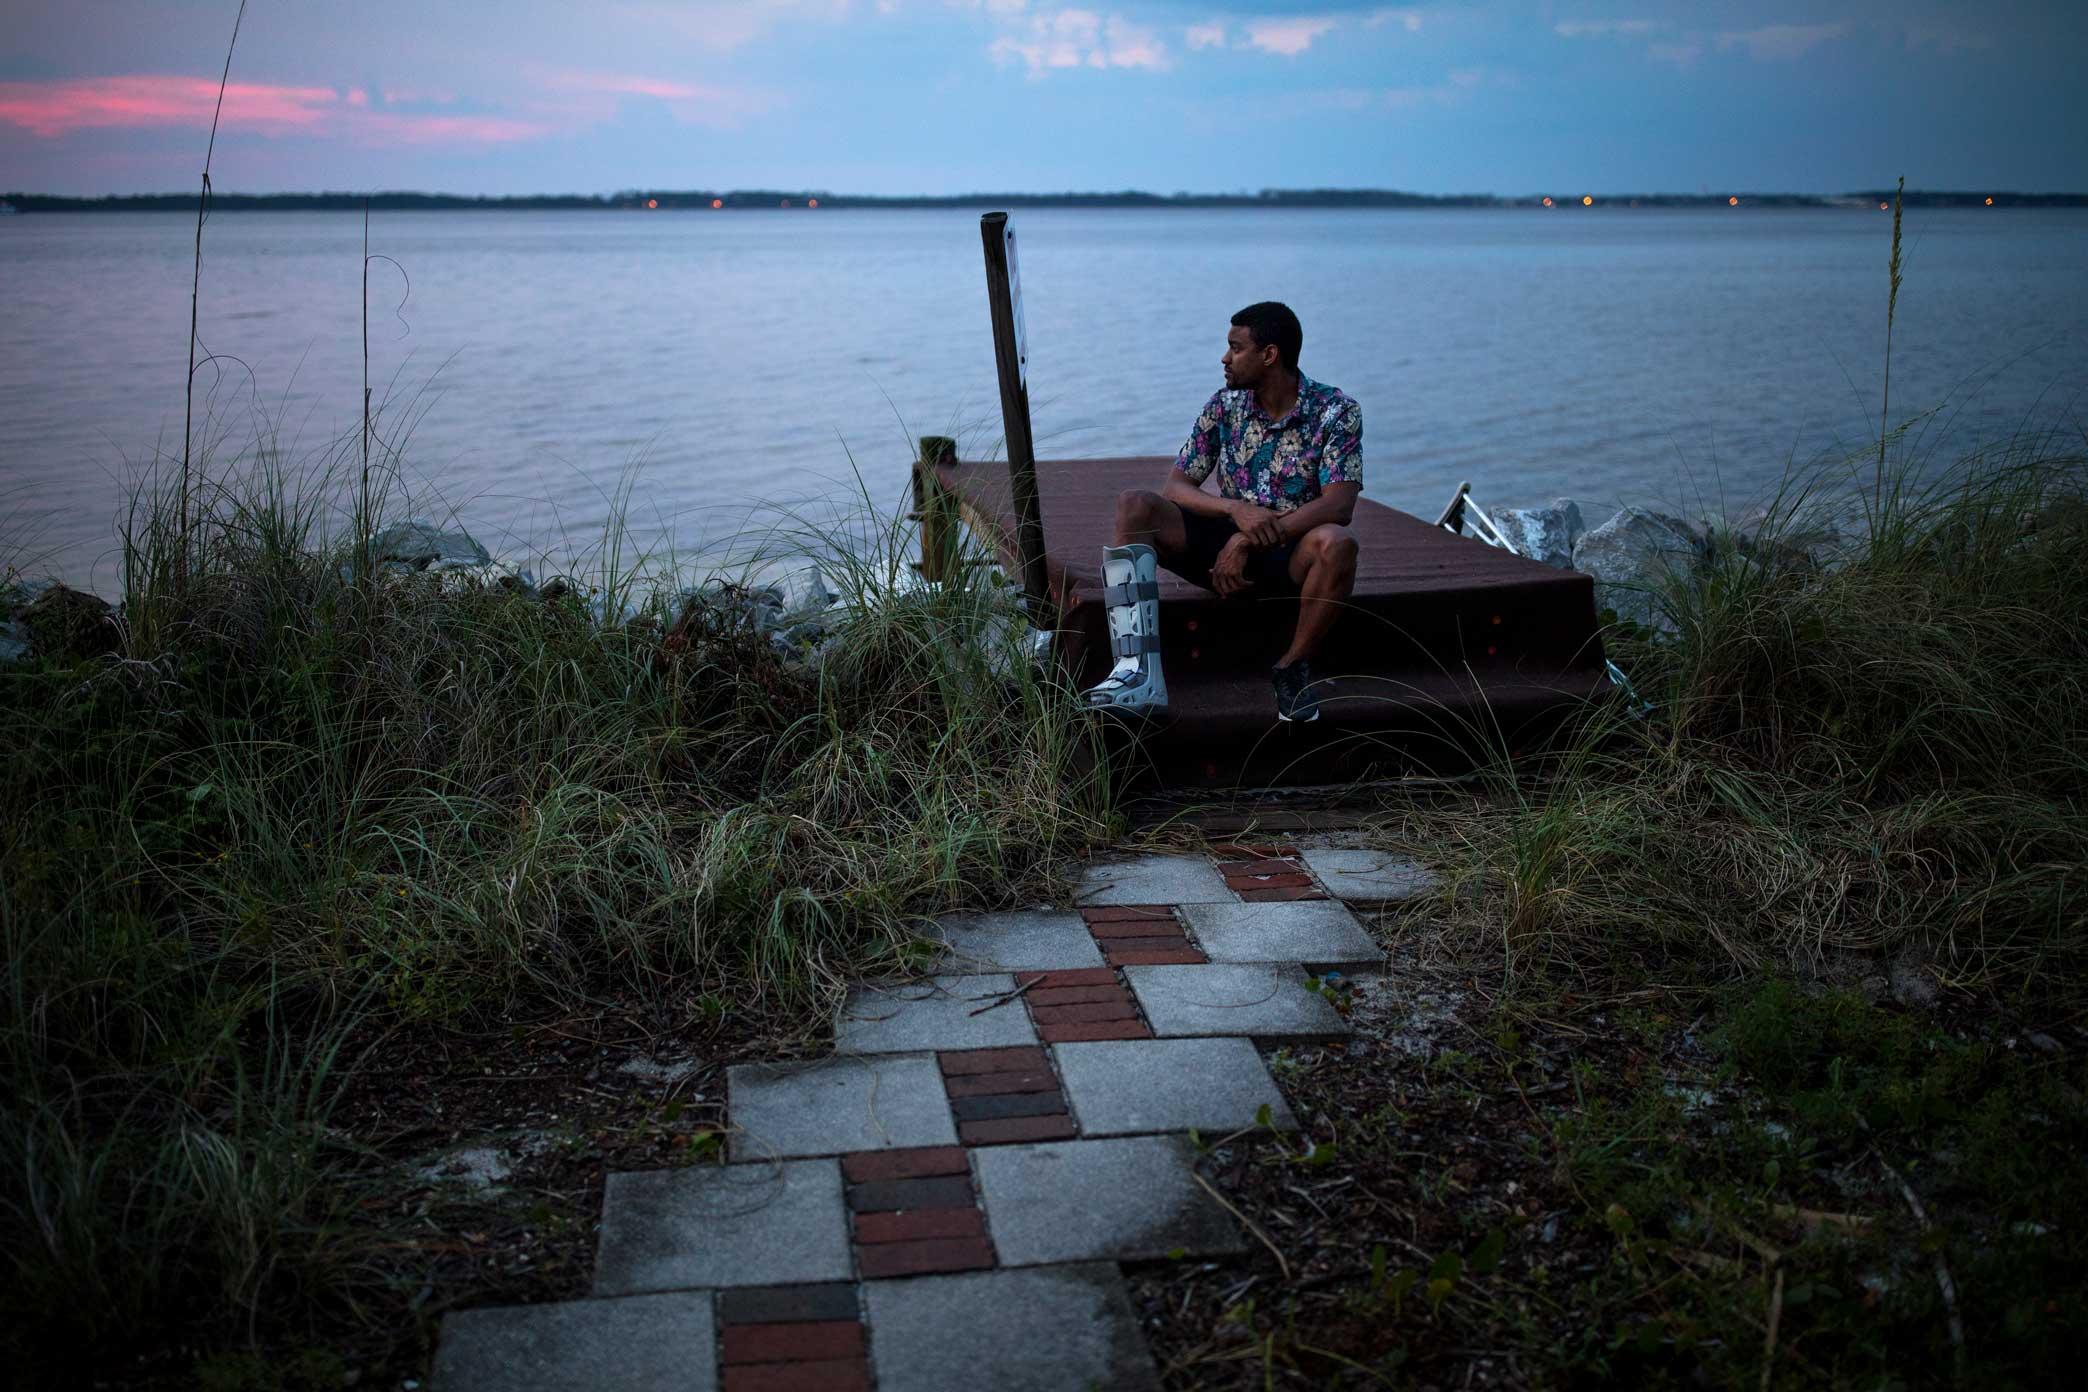 Self Portrait. Pensacola, Florida. 2017. Canon 5D Mark IV